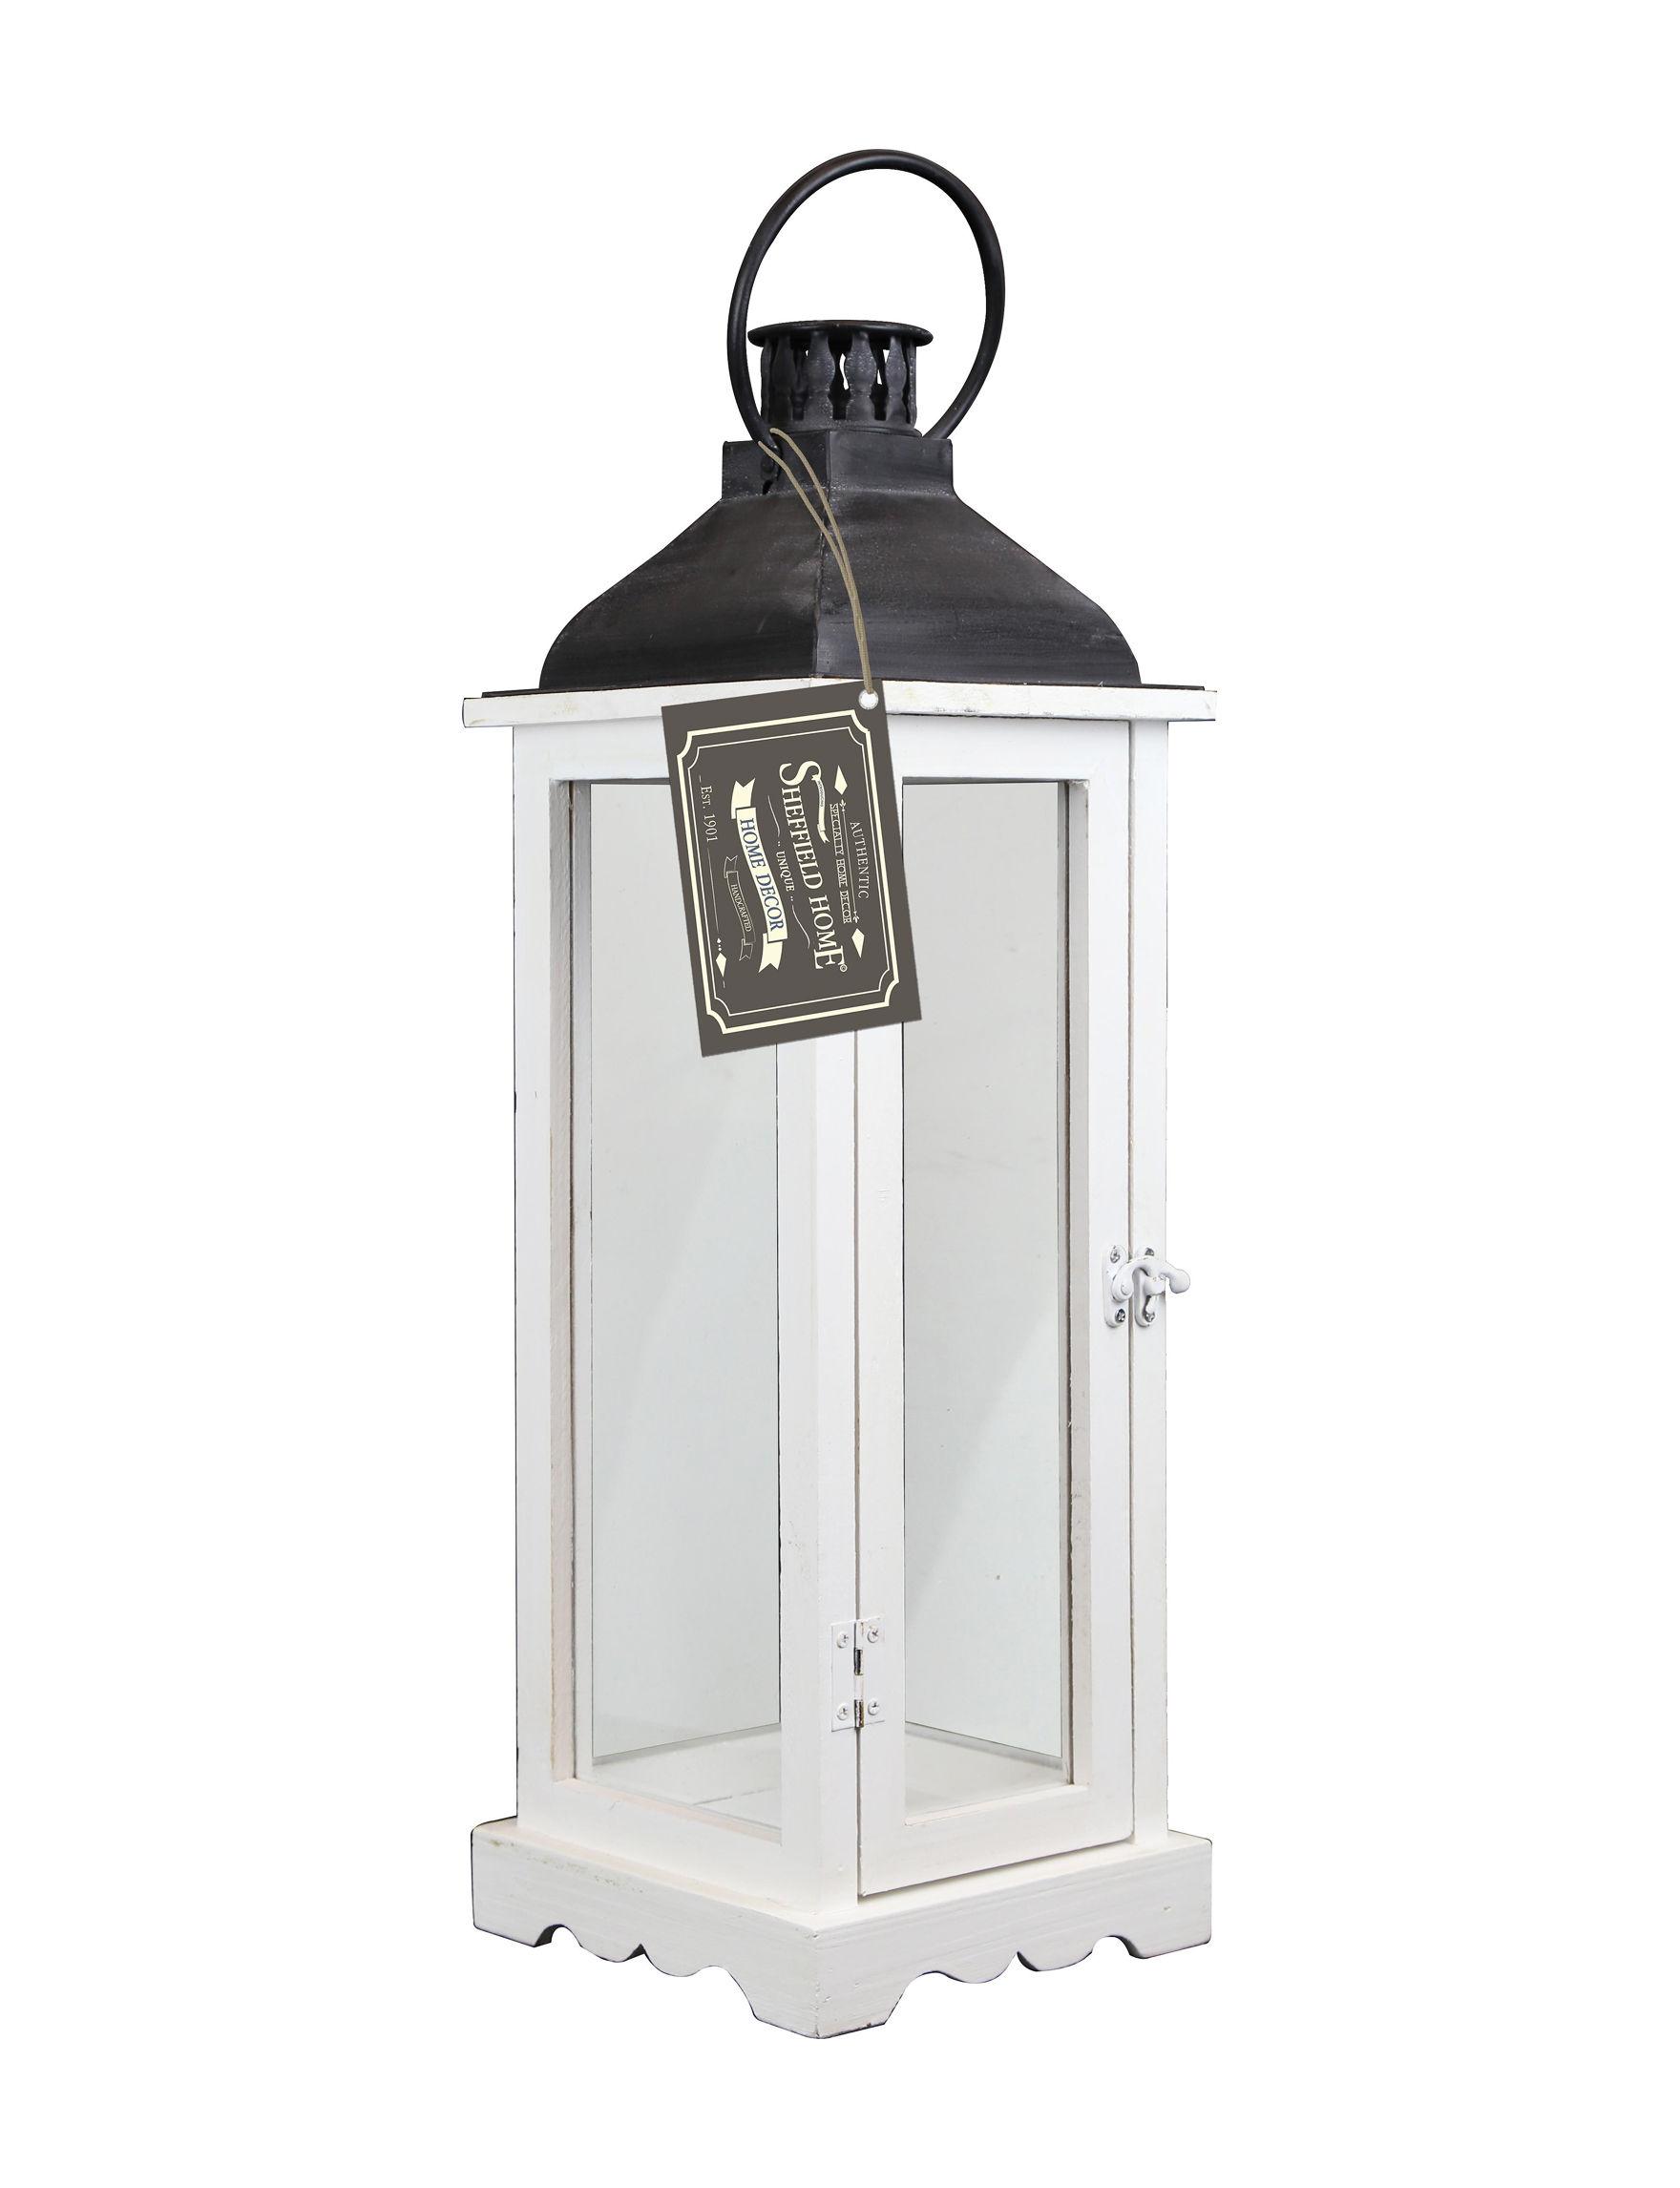 Enchante White Lights & Lanterns Home Accents